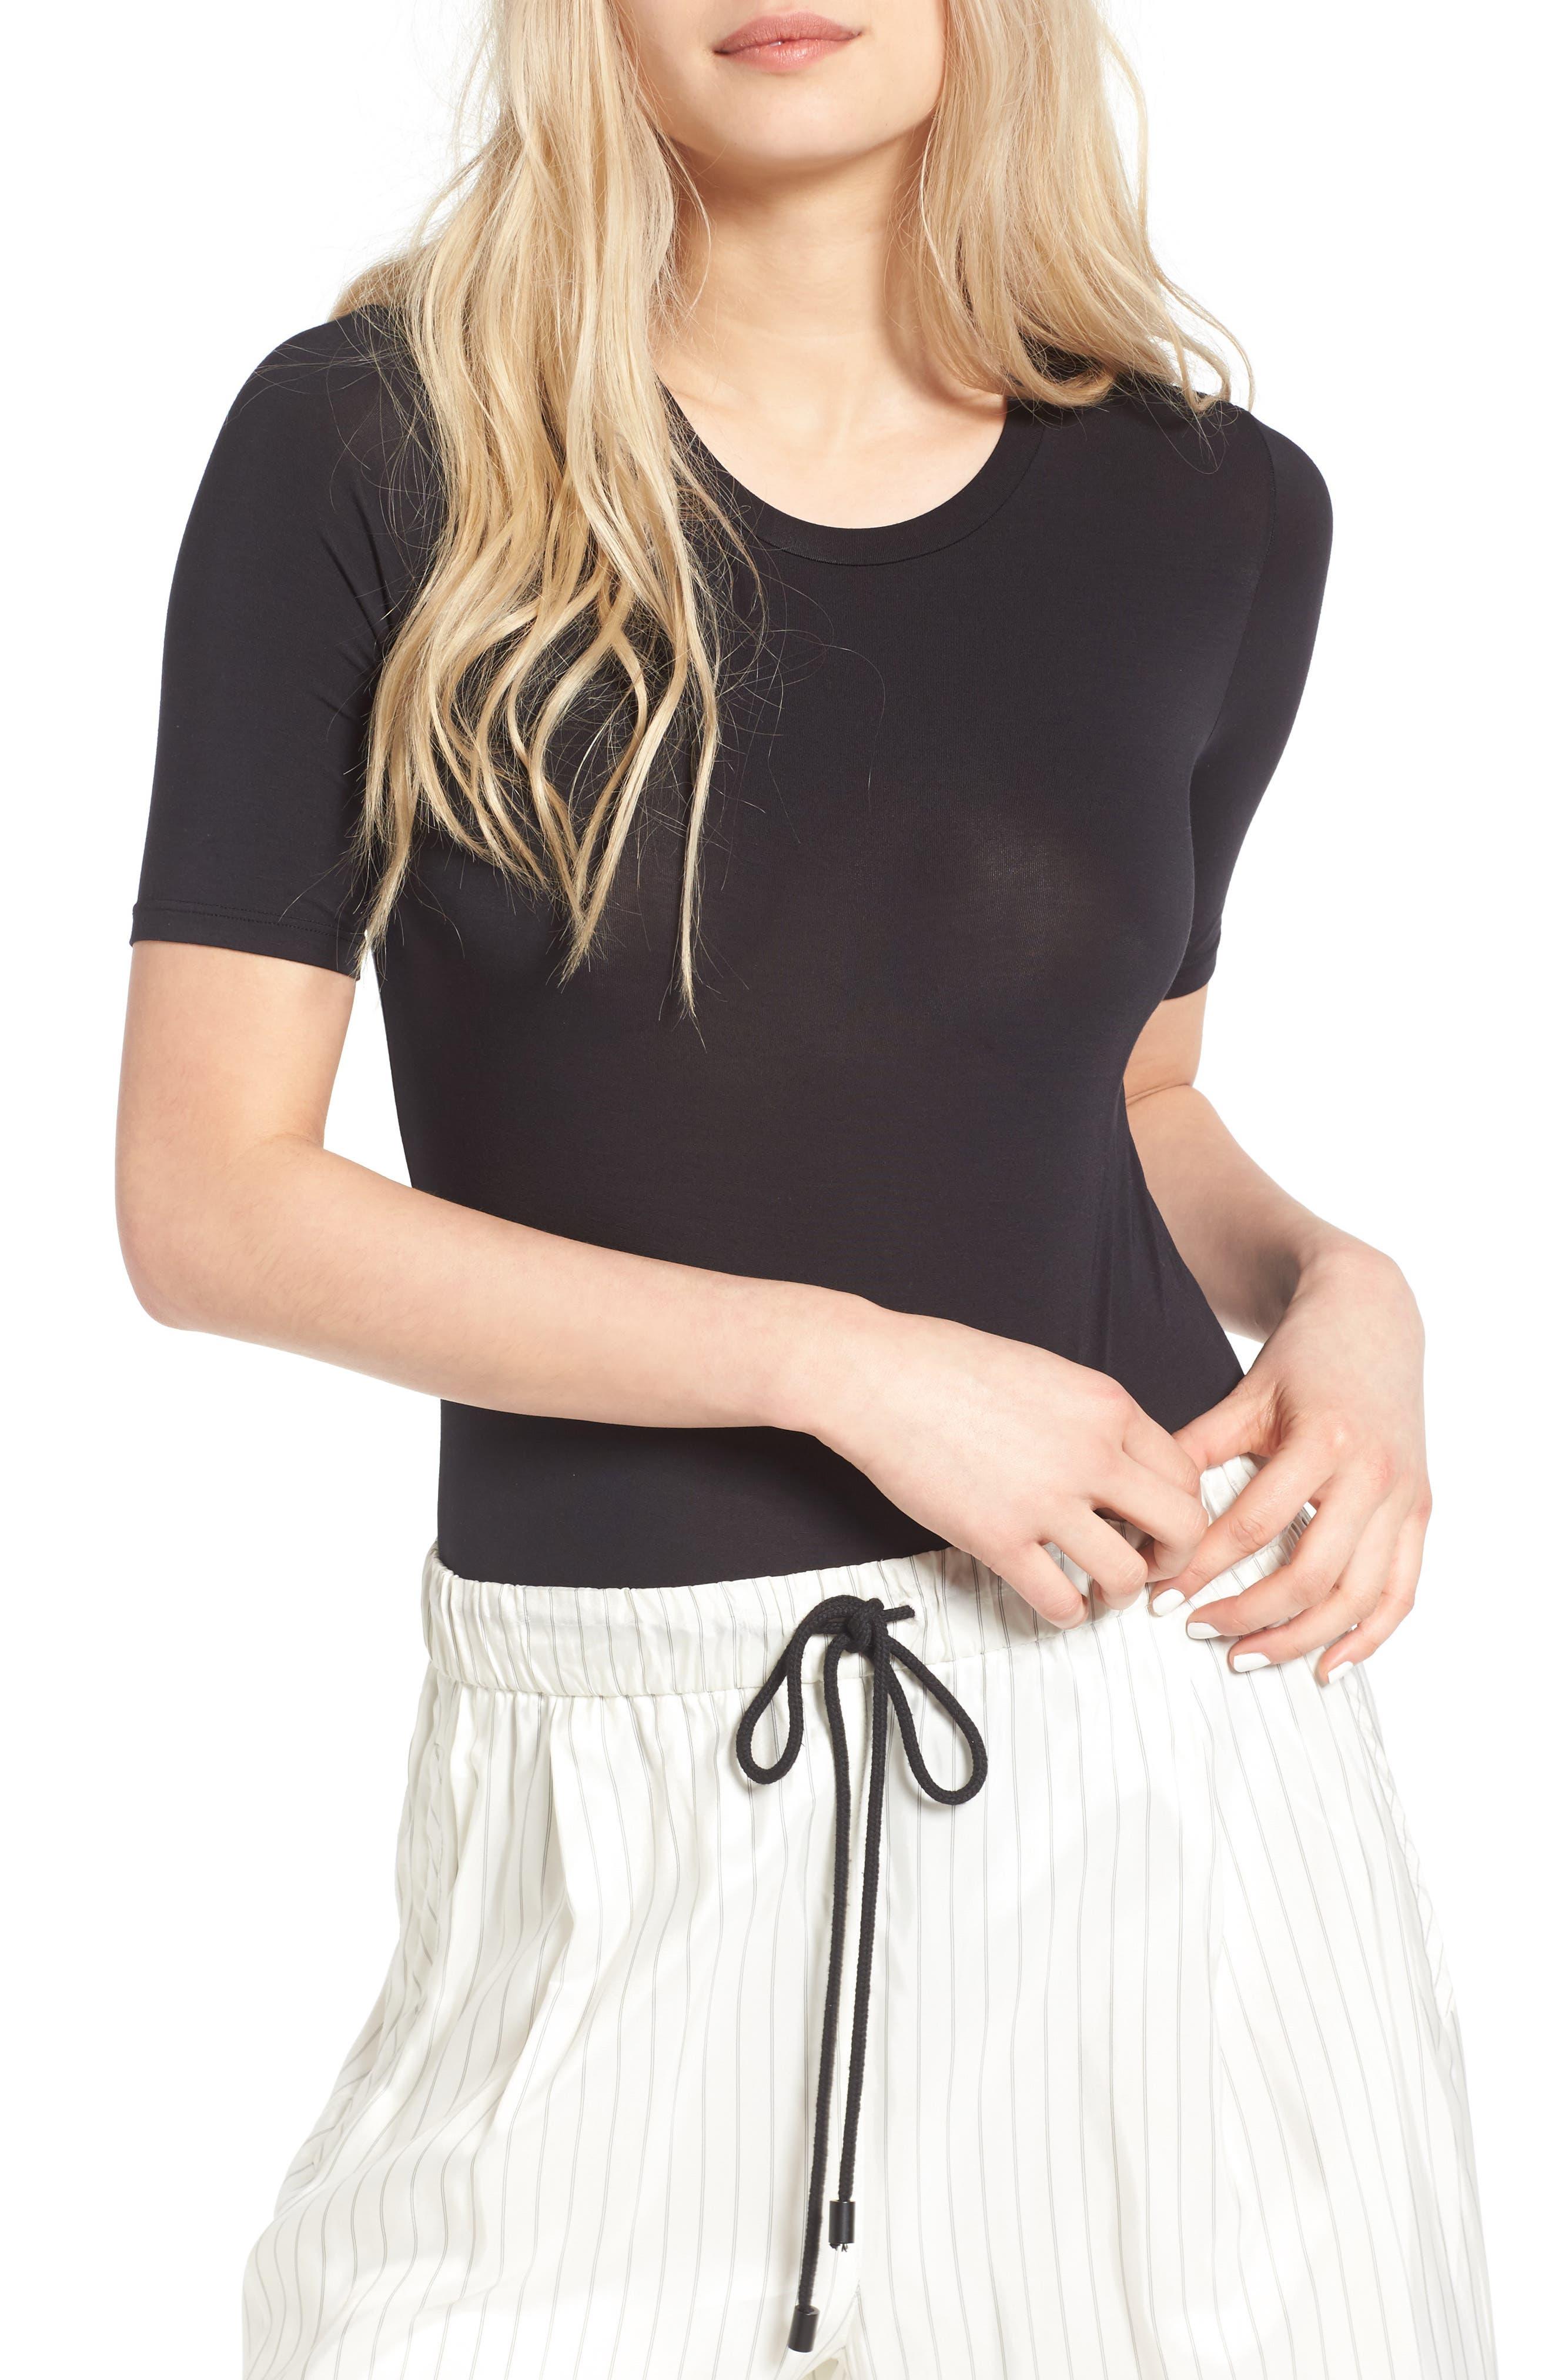 Alternate Image 1 Selected - Tuxe Keynote Bodysuit